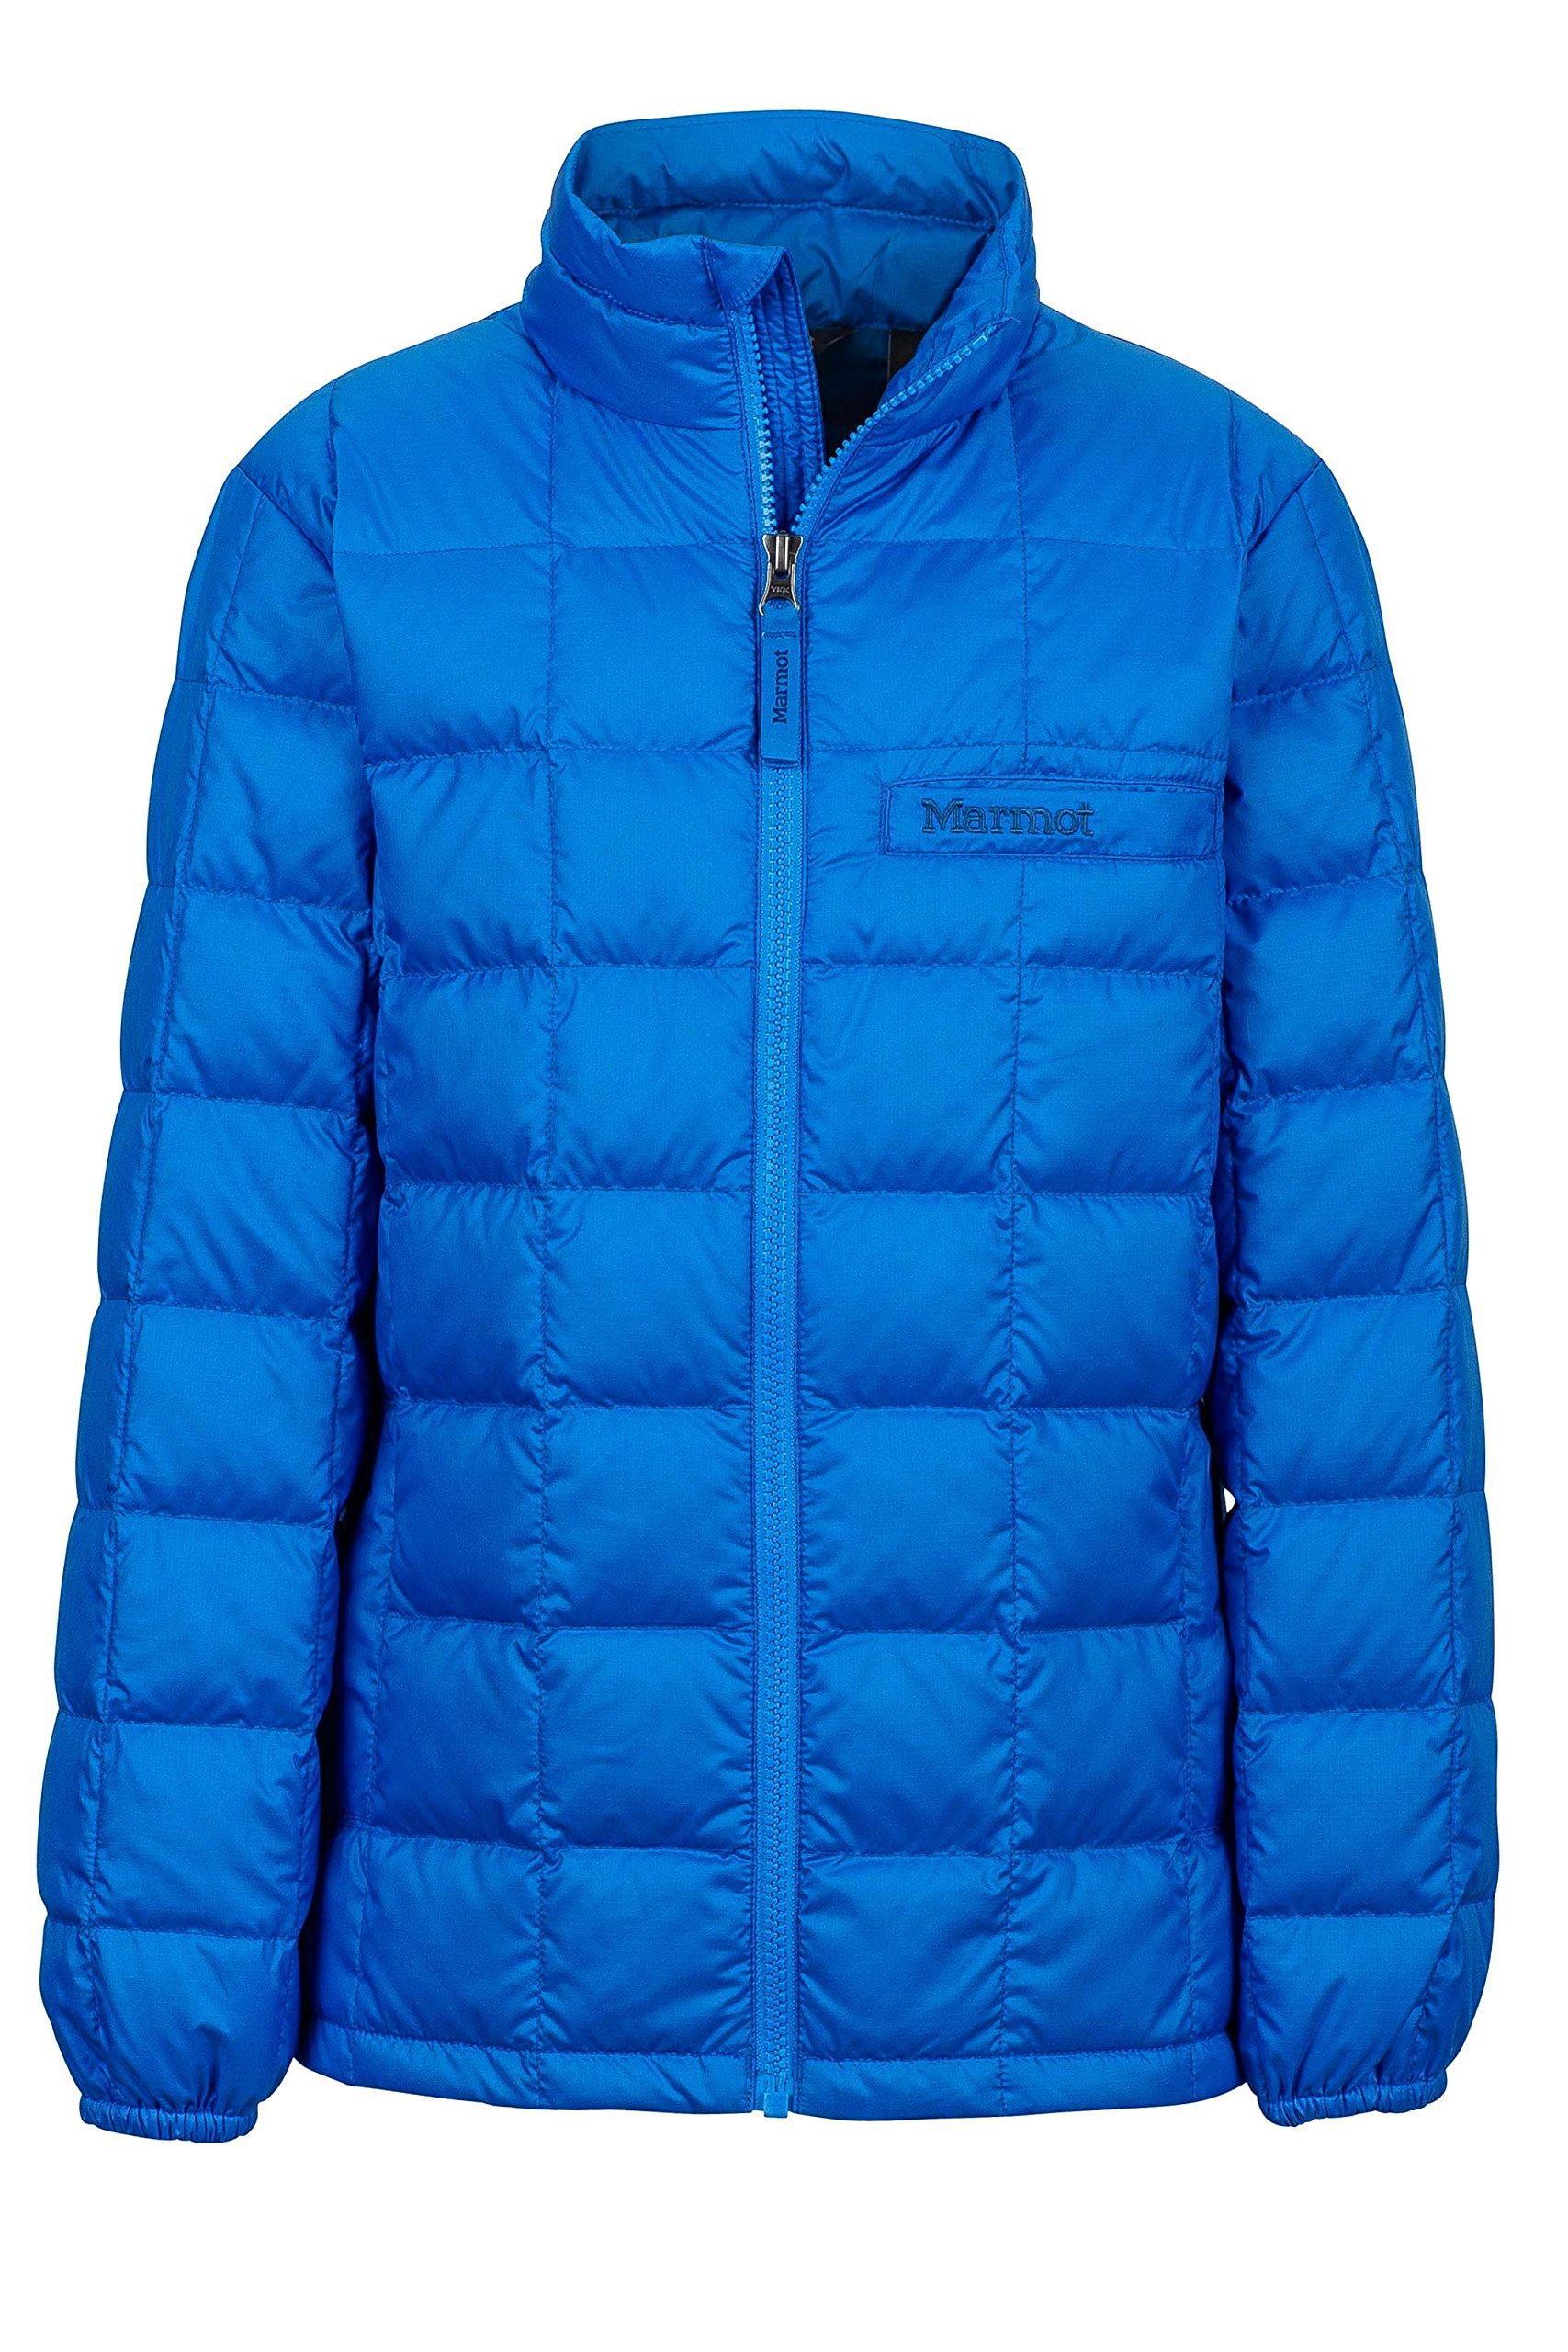 Marmot Ajax Boys' Down Puffer Jacket, Fill Power 600, Cobalt Blue by Marmot